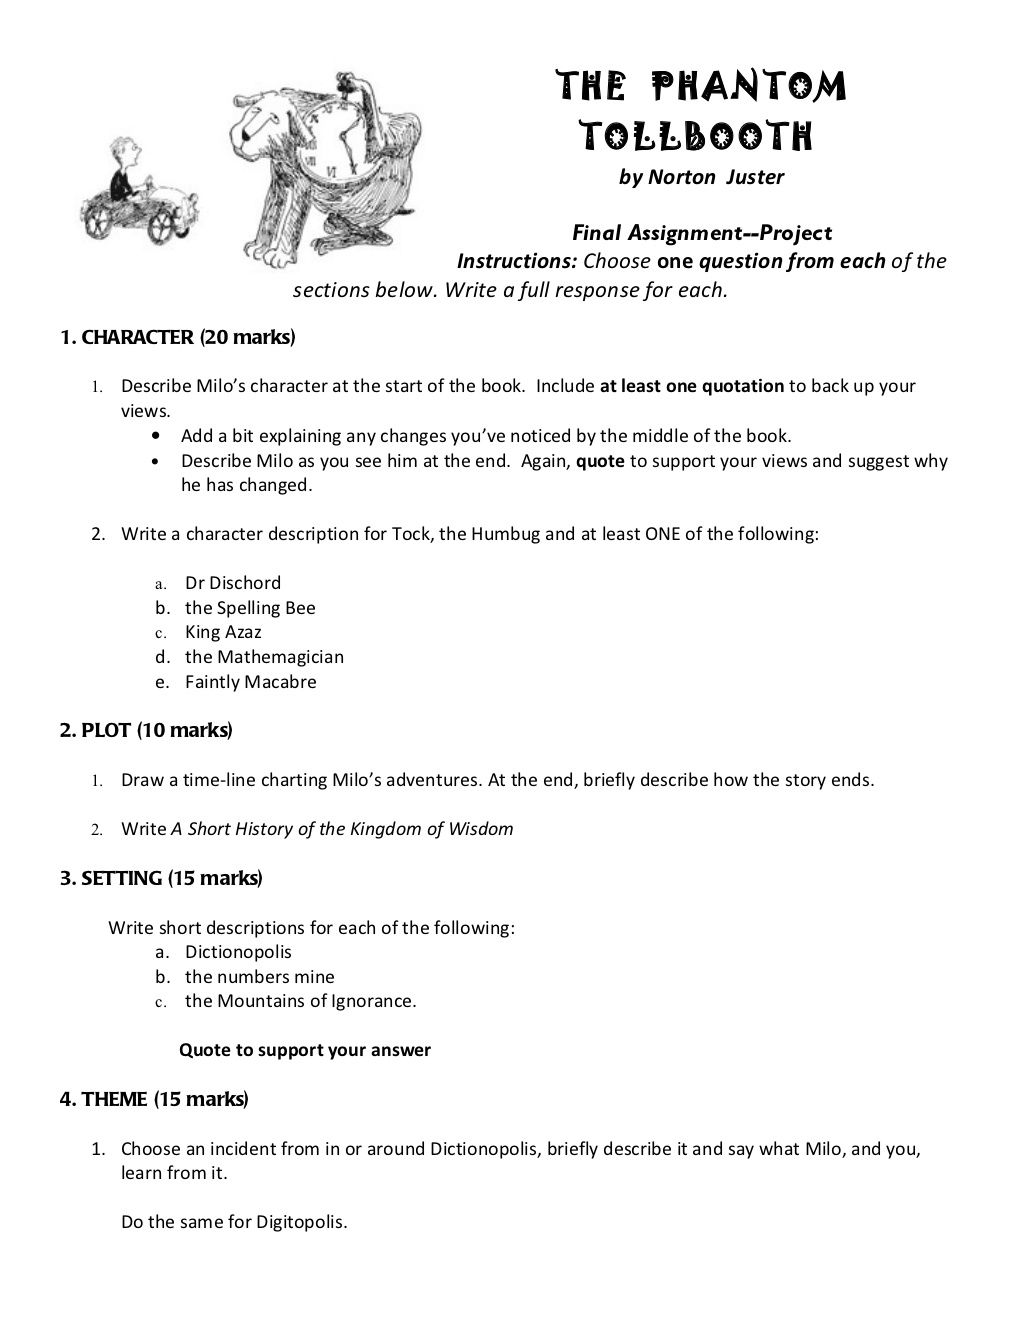 worksheet Phantom Tollbooth Worksheets phantom tollbooth final assignment by mr green via slideshare slideshare